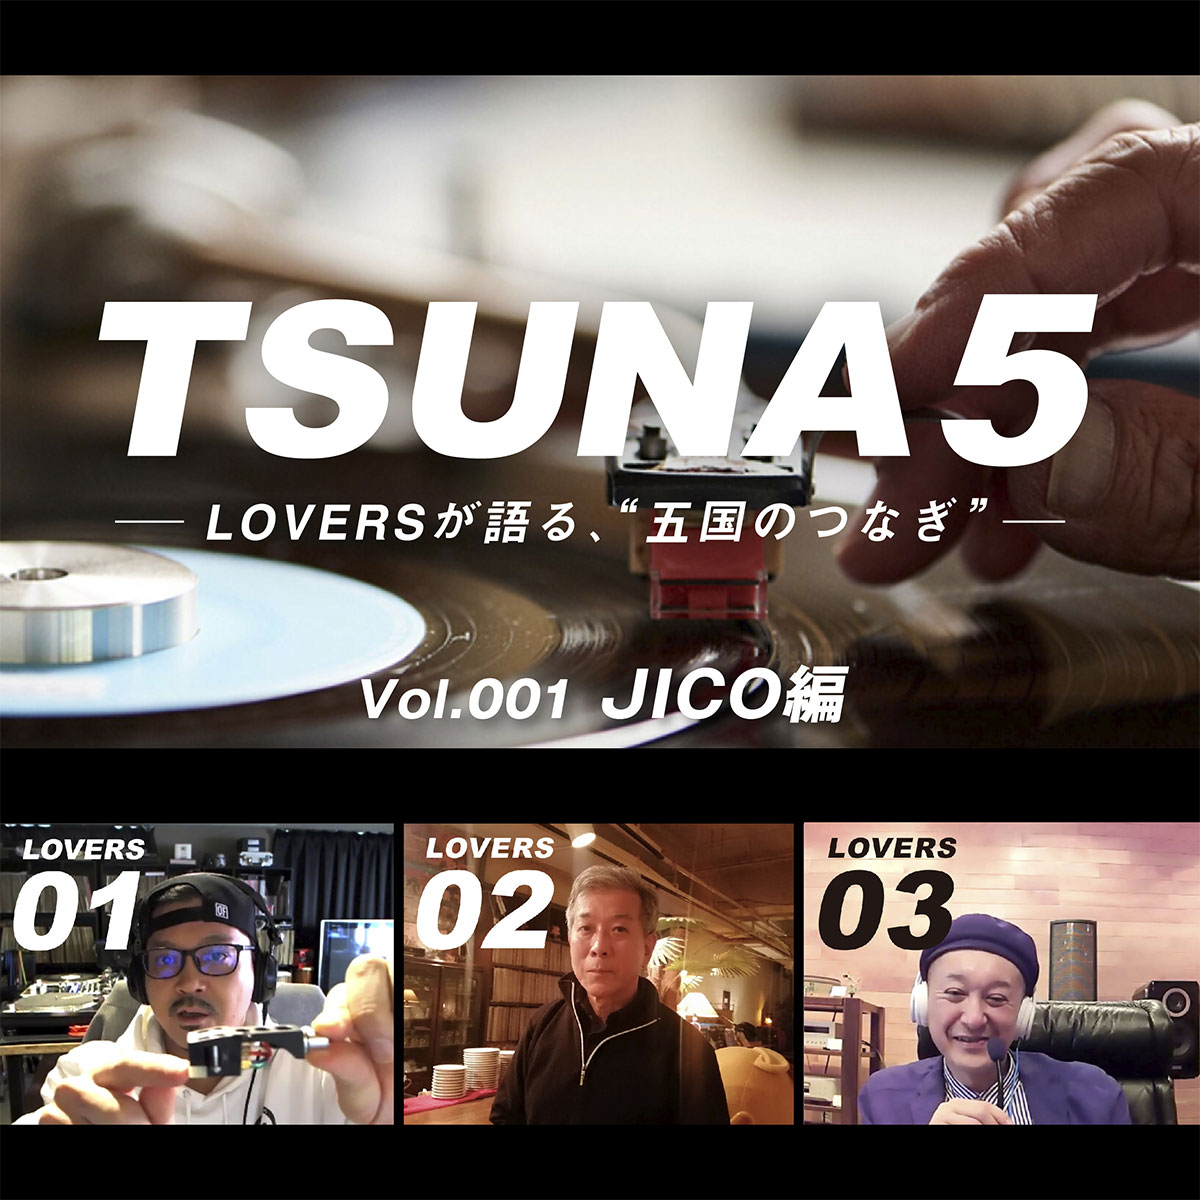 "【TSUNA5-LOVERSが語る五国の""つなぎ""-】vol.001 JICO篇"